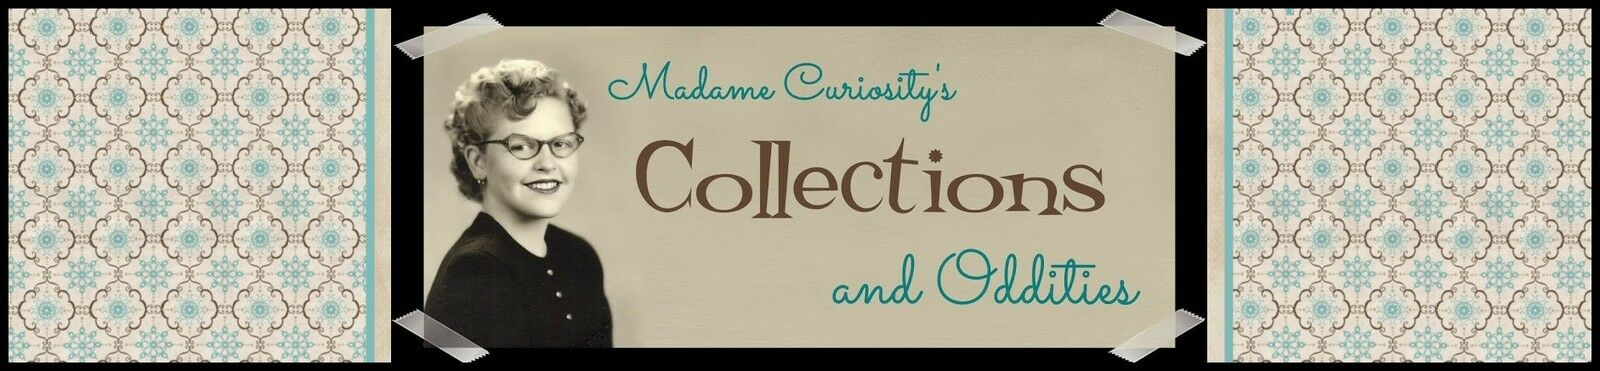 Madame Curiosity's